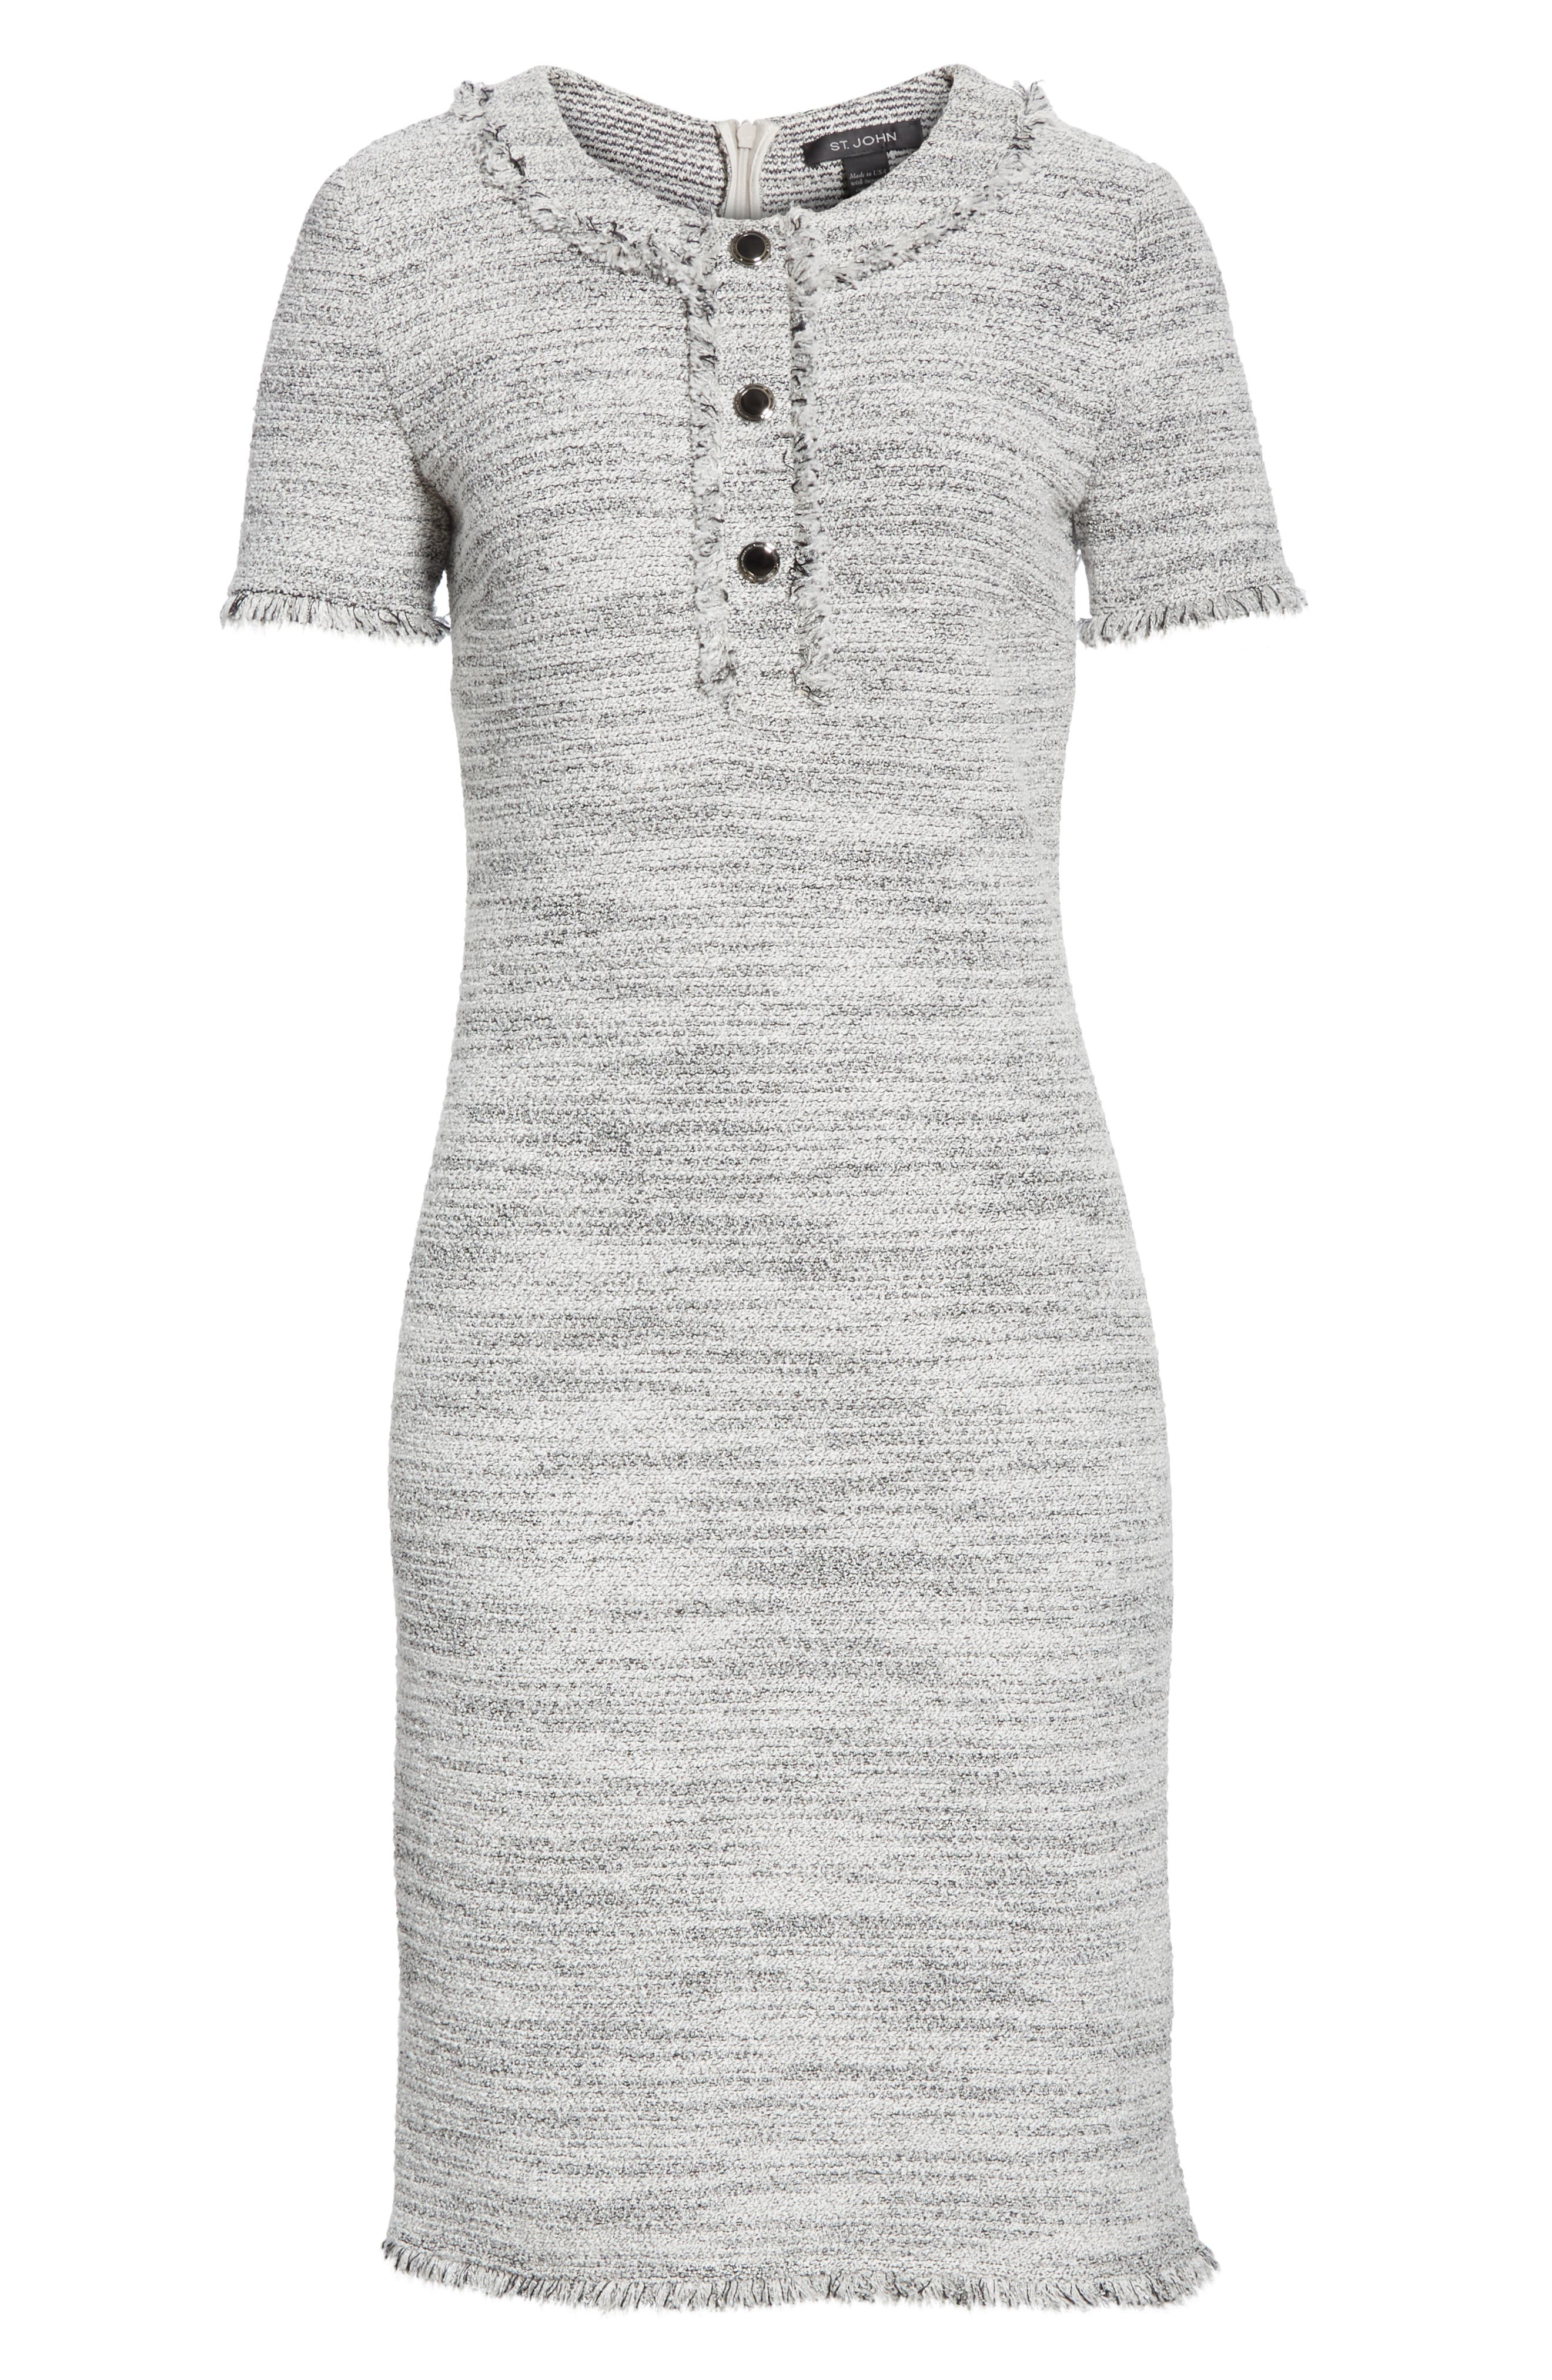 ST. JOHN COLLECTION, Eaton Place Tweed Knit Dress, Alternate thumbnail 7, color, CAVIAR/ CREAM